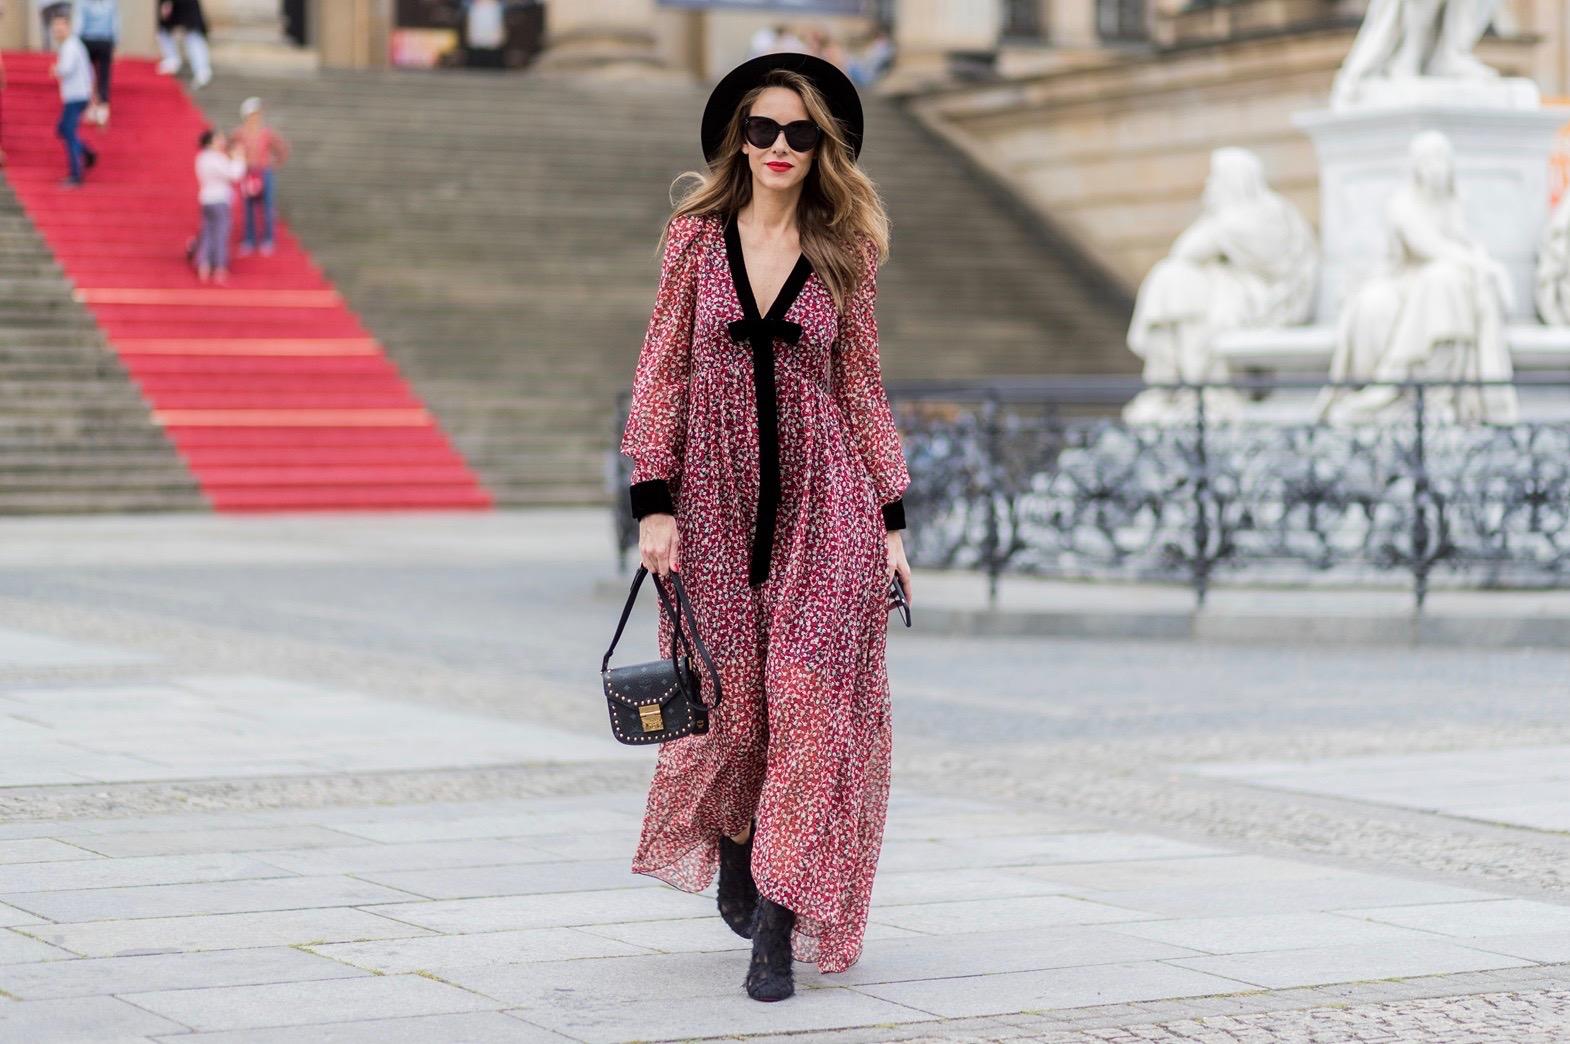 f1a82d0cc2 ... Alexandra Lapp wearing Boho Style